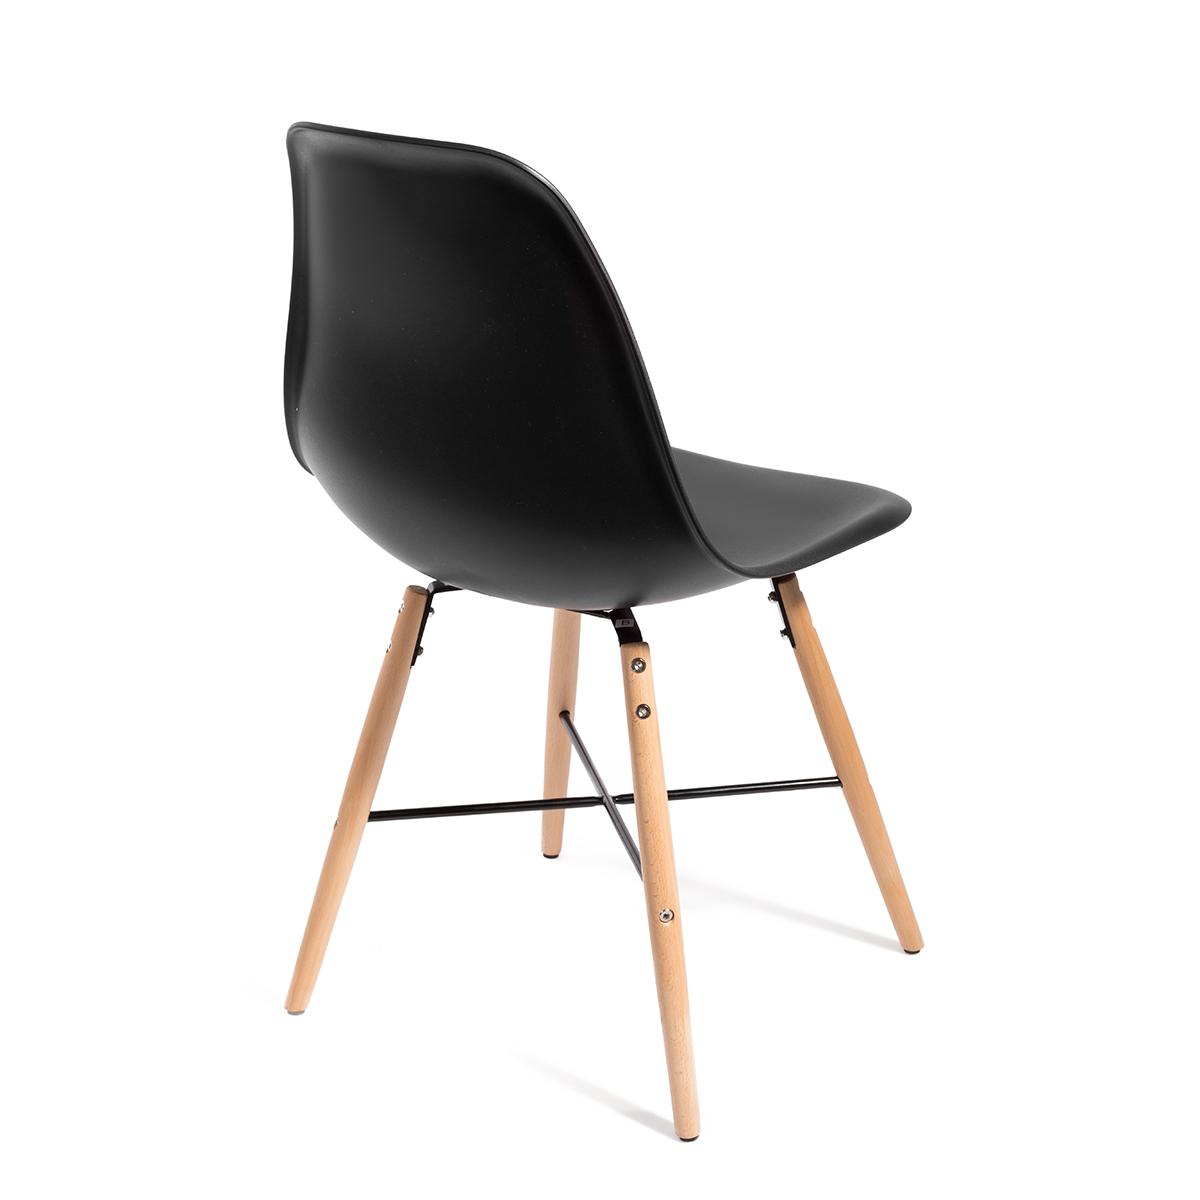 Stuhl set design st hle esszimmerst hle b rost hle for Stuhl design ebay